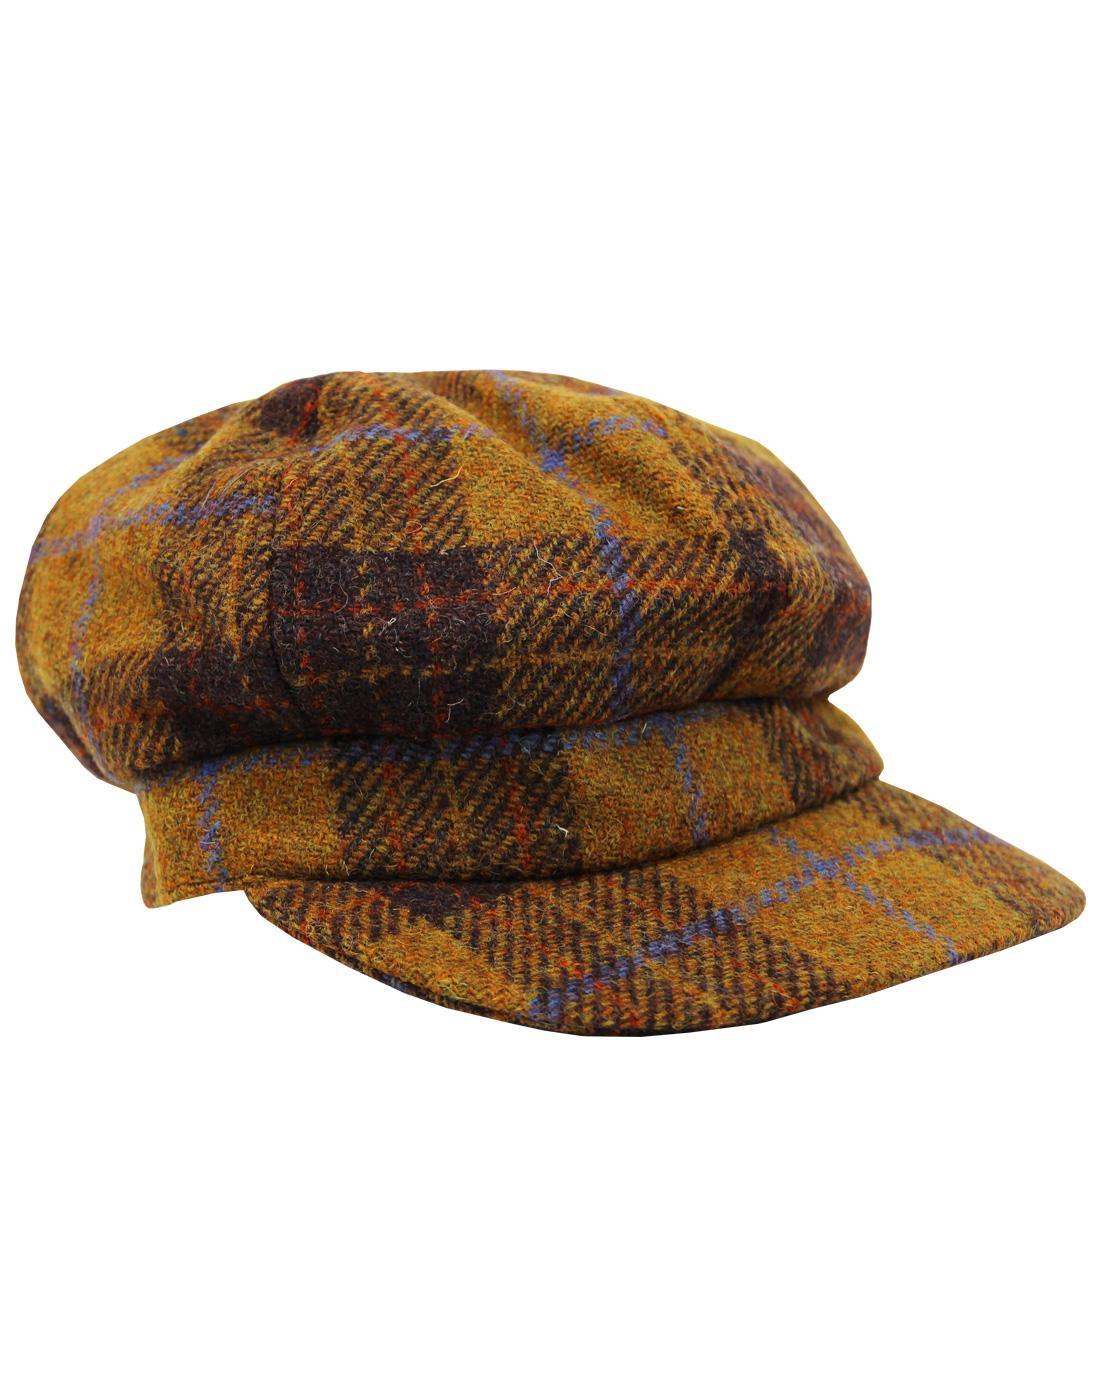 FAILSWORTH Retro Harris Tweed Womens Bakerboy Cap